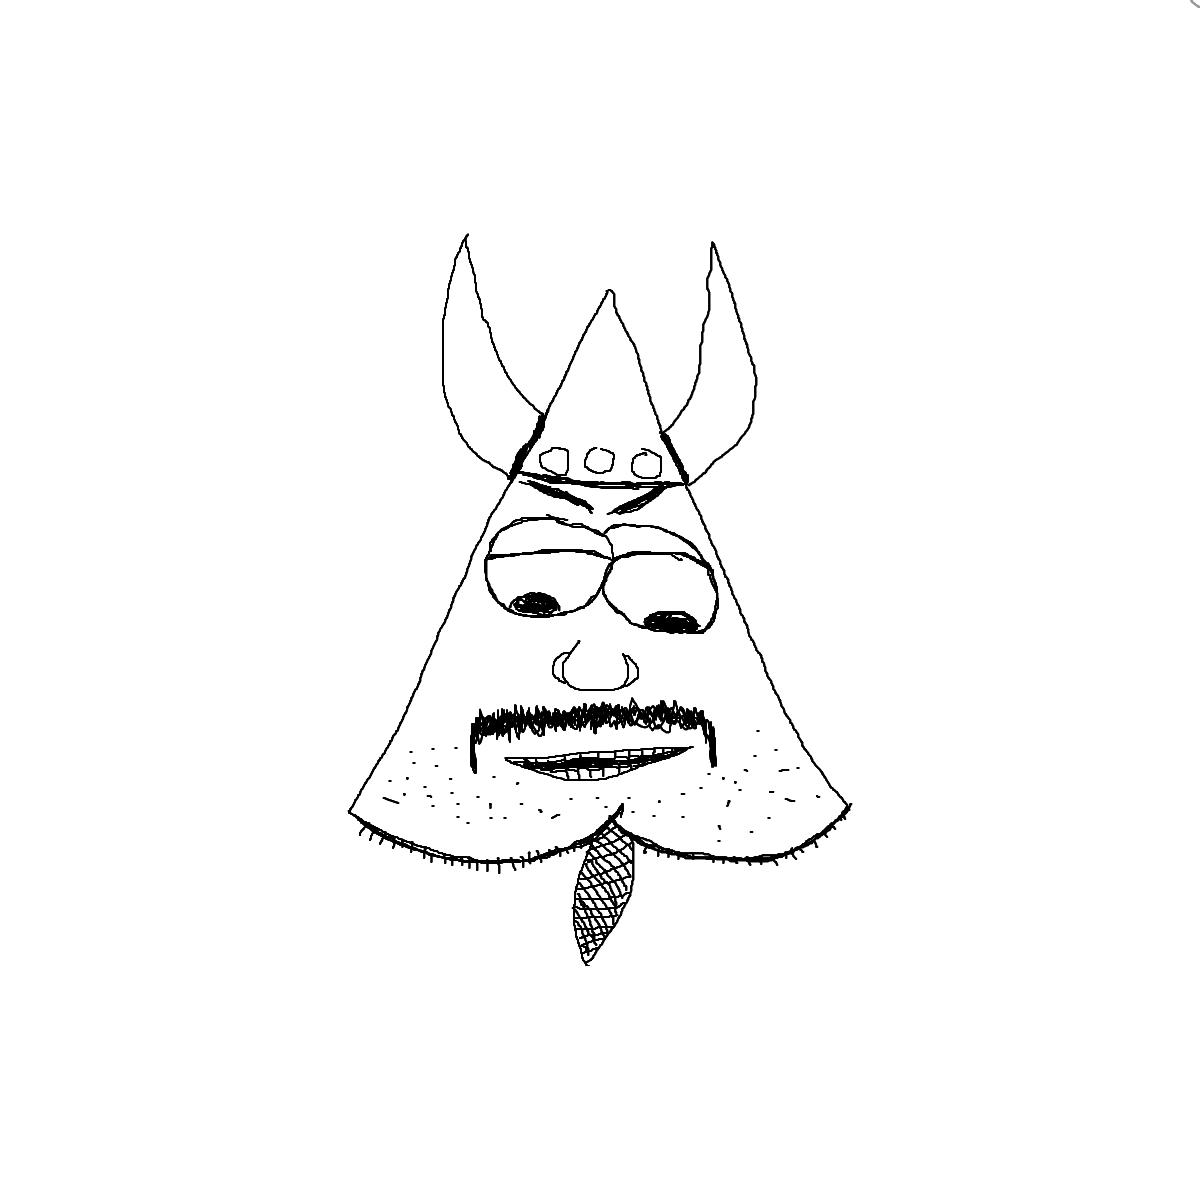 BAAAM drawing#2240 lat:43.3357353210449200lng: -1.9728780984878540